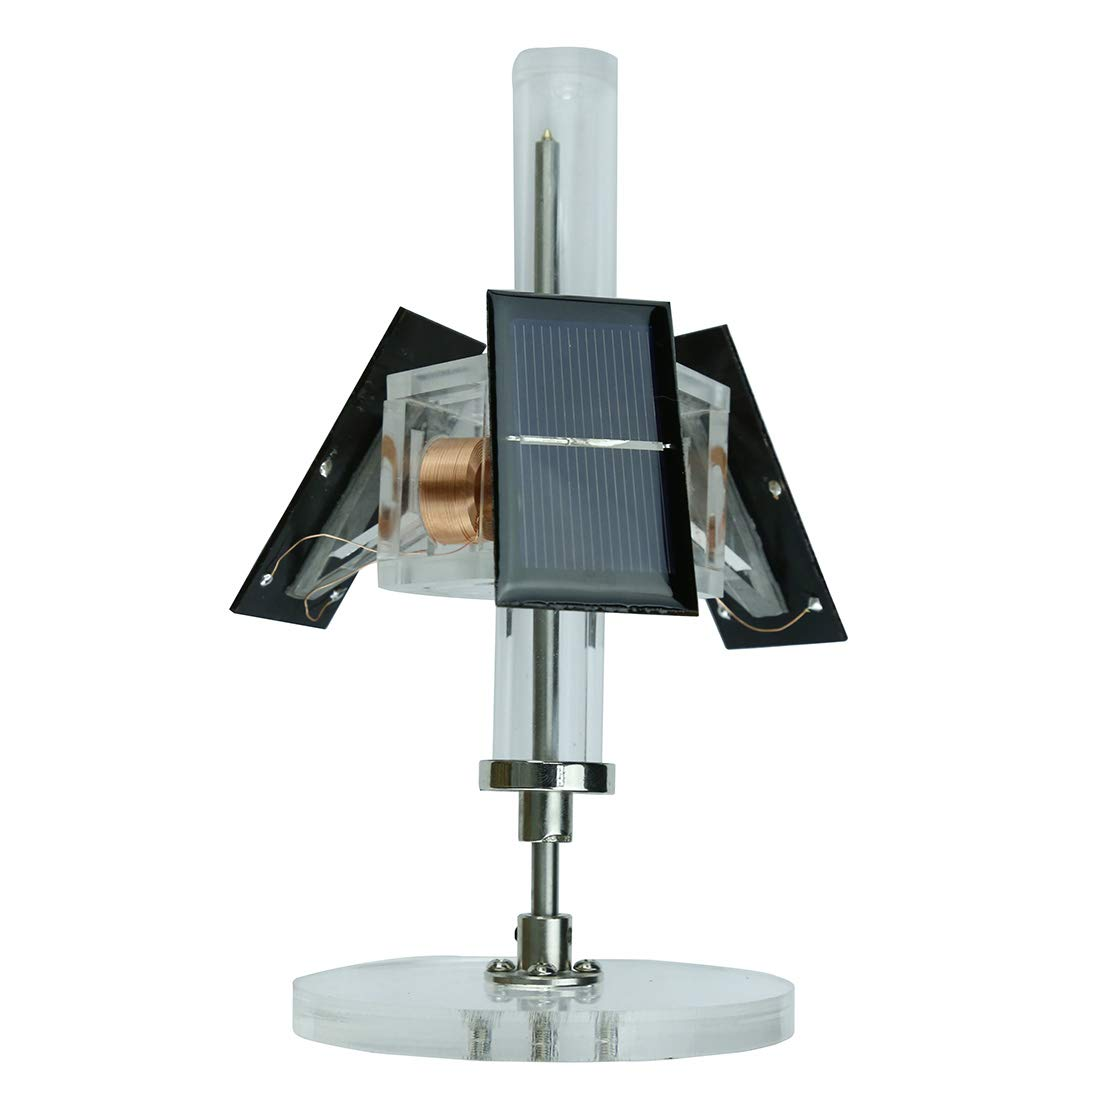 Yamix Solar Motor Magnetic Levitating Educational Model Physical Science Solar Power Experiment Model